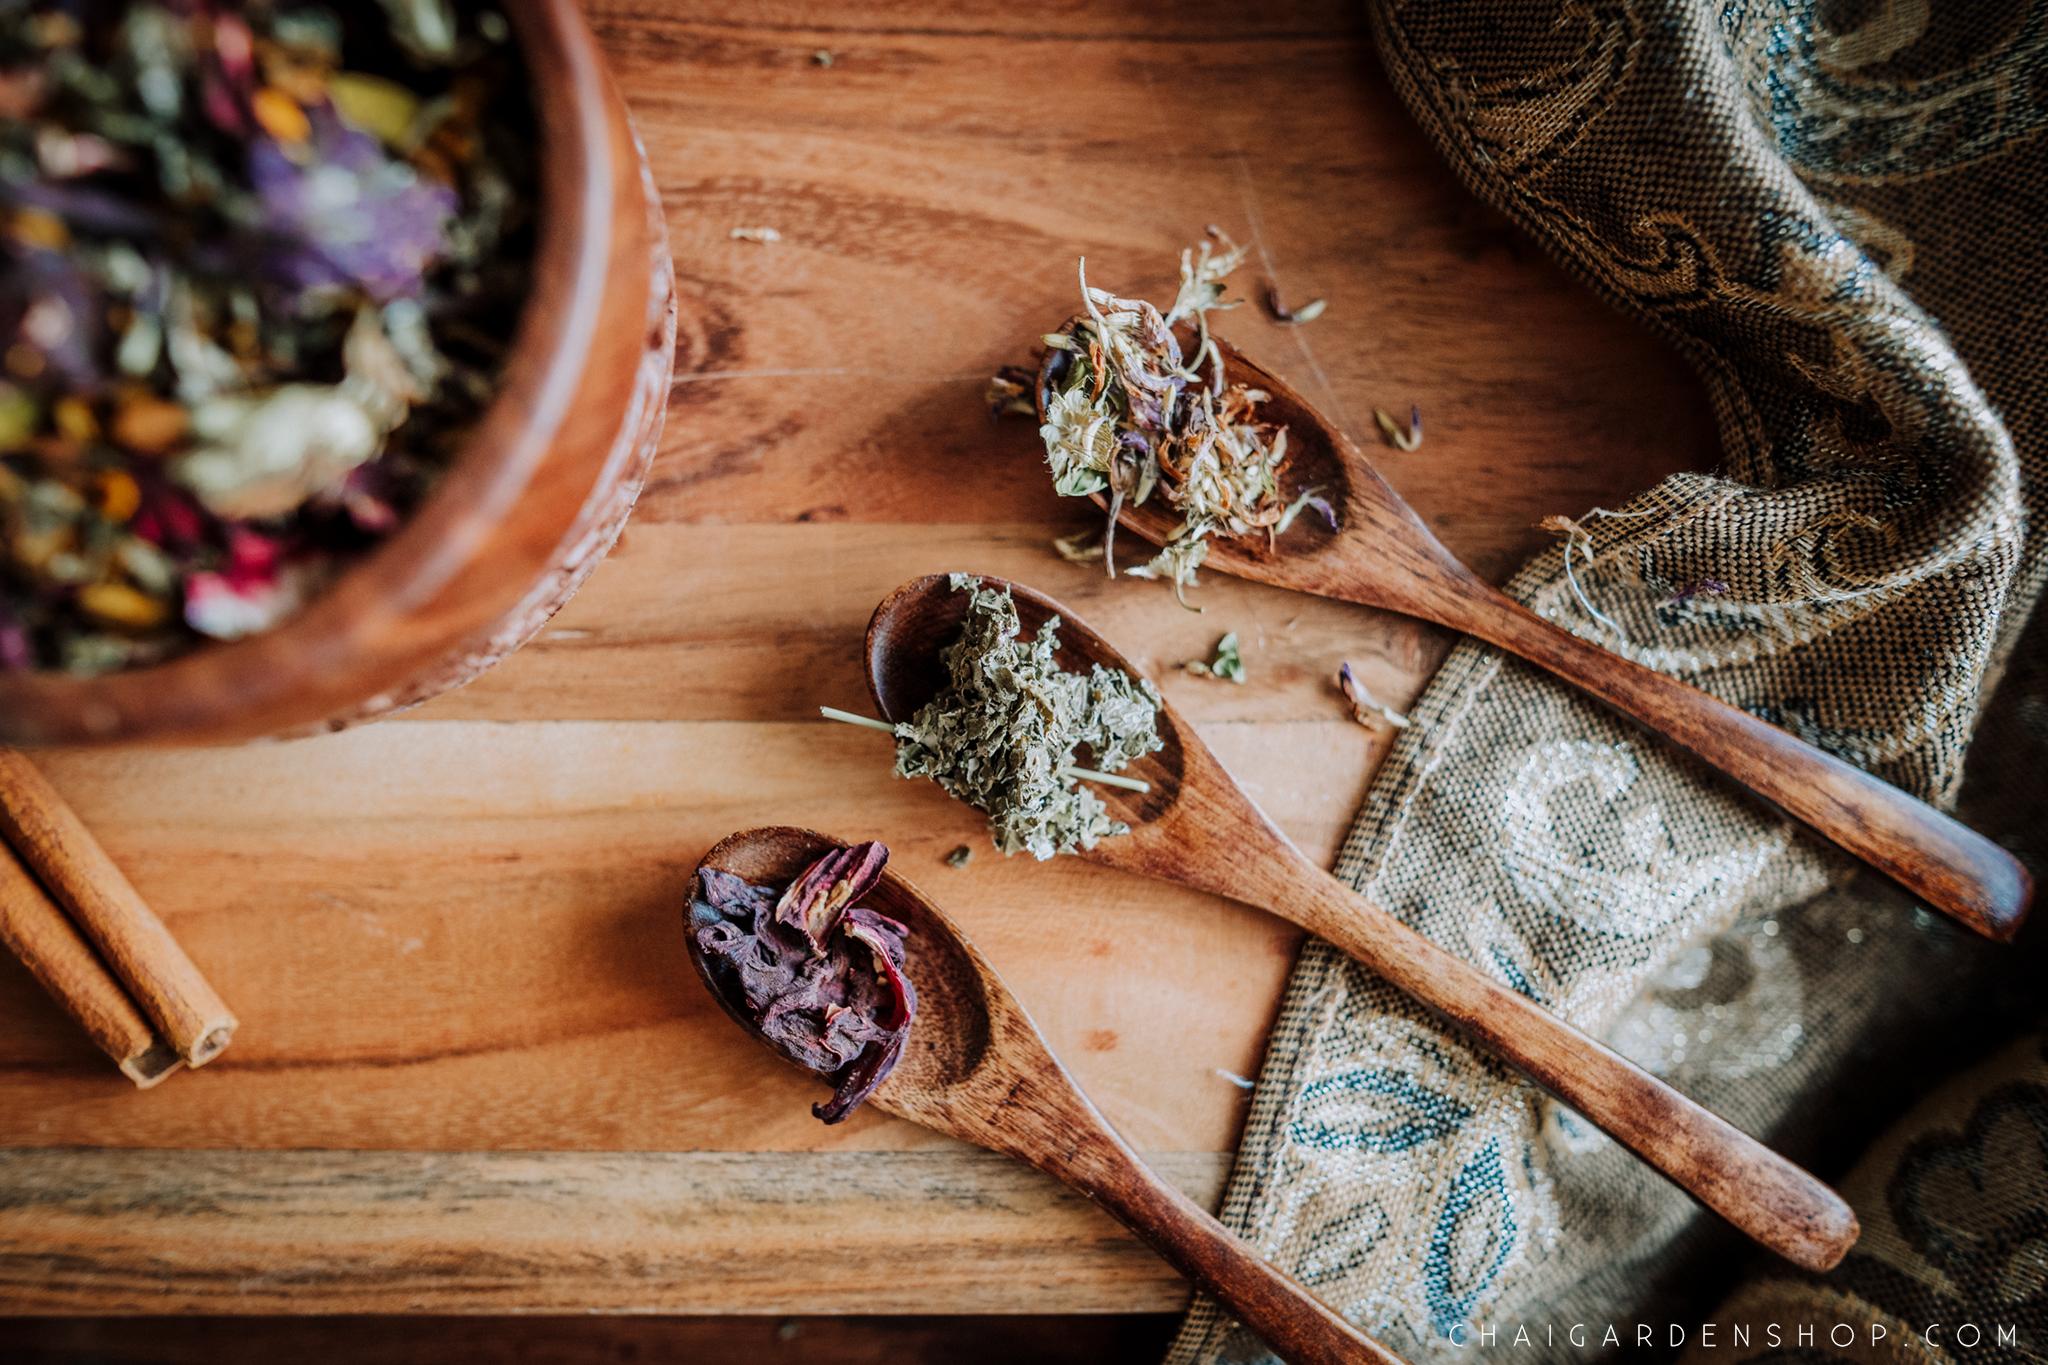 women's-wellness-tea,-well-woman-chai,-women's-health-chai,-menstruation-tea-organic, chai garden, organic herbal chai, organic tea, spokane wa, pregnancy tea spokane